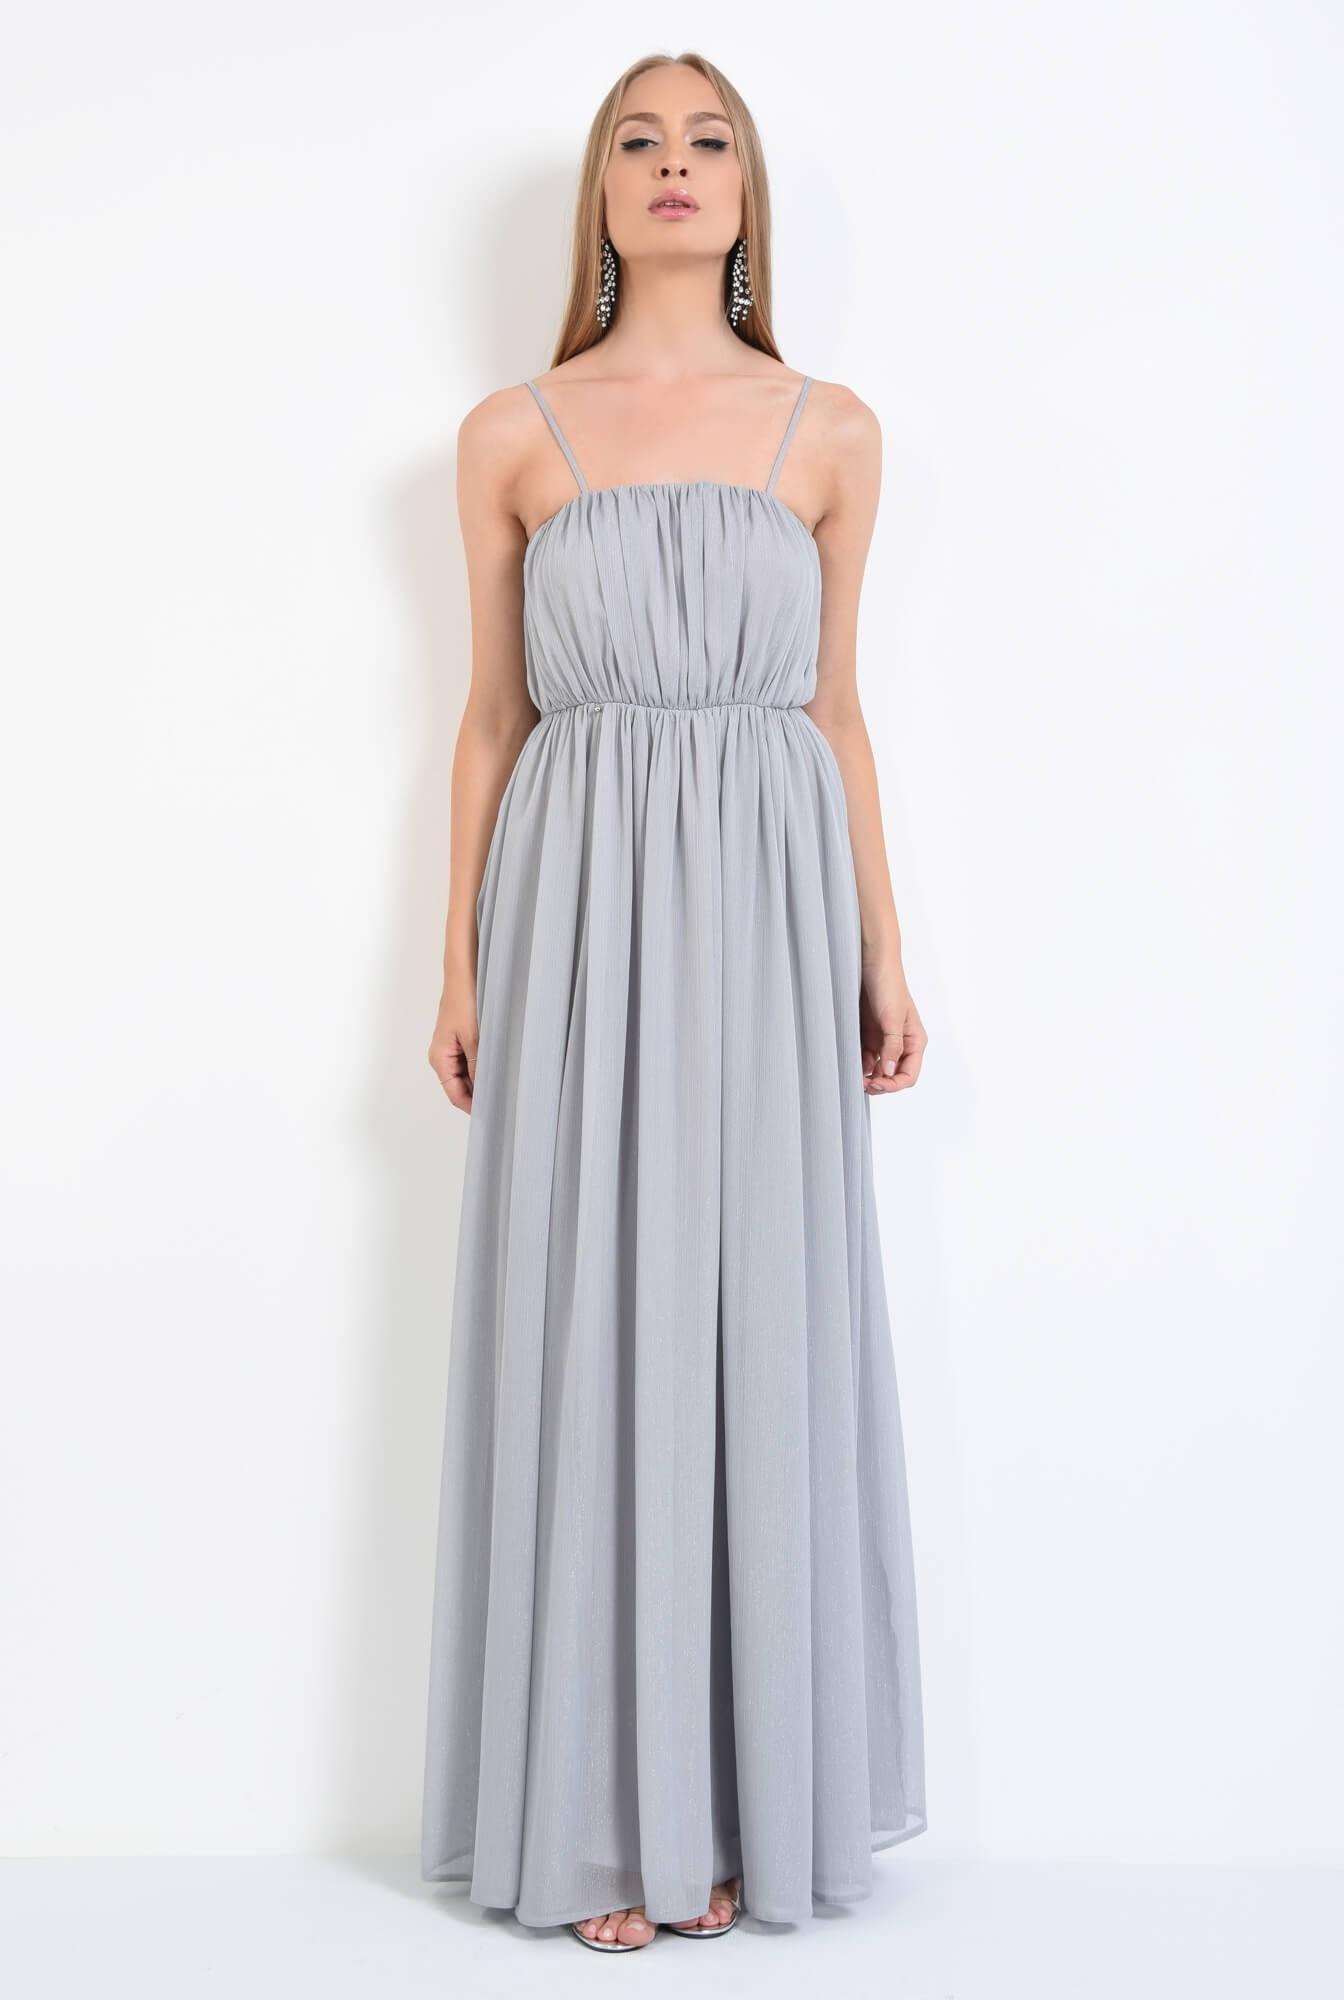 3 - rochie de seara, pliuri, argintiu, lunga, voal